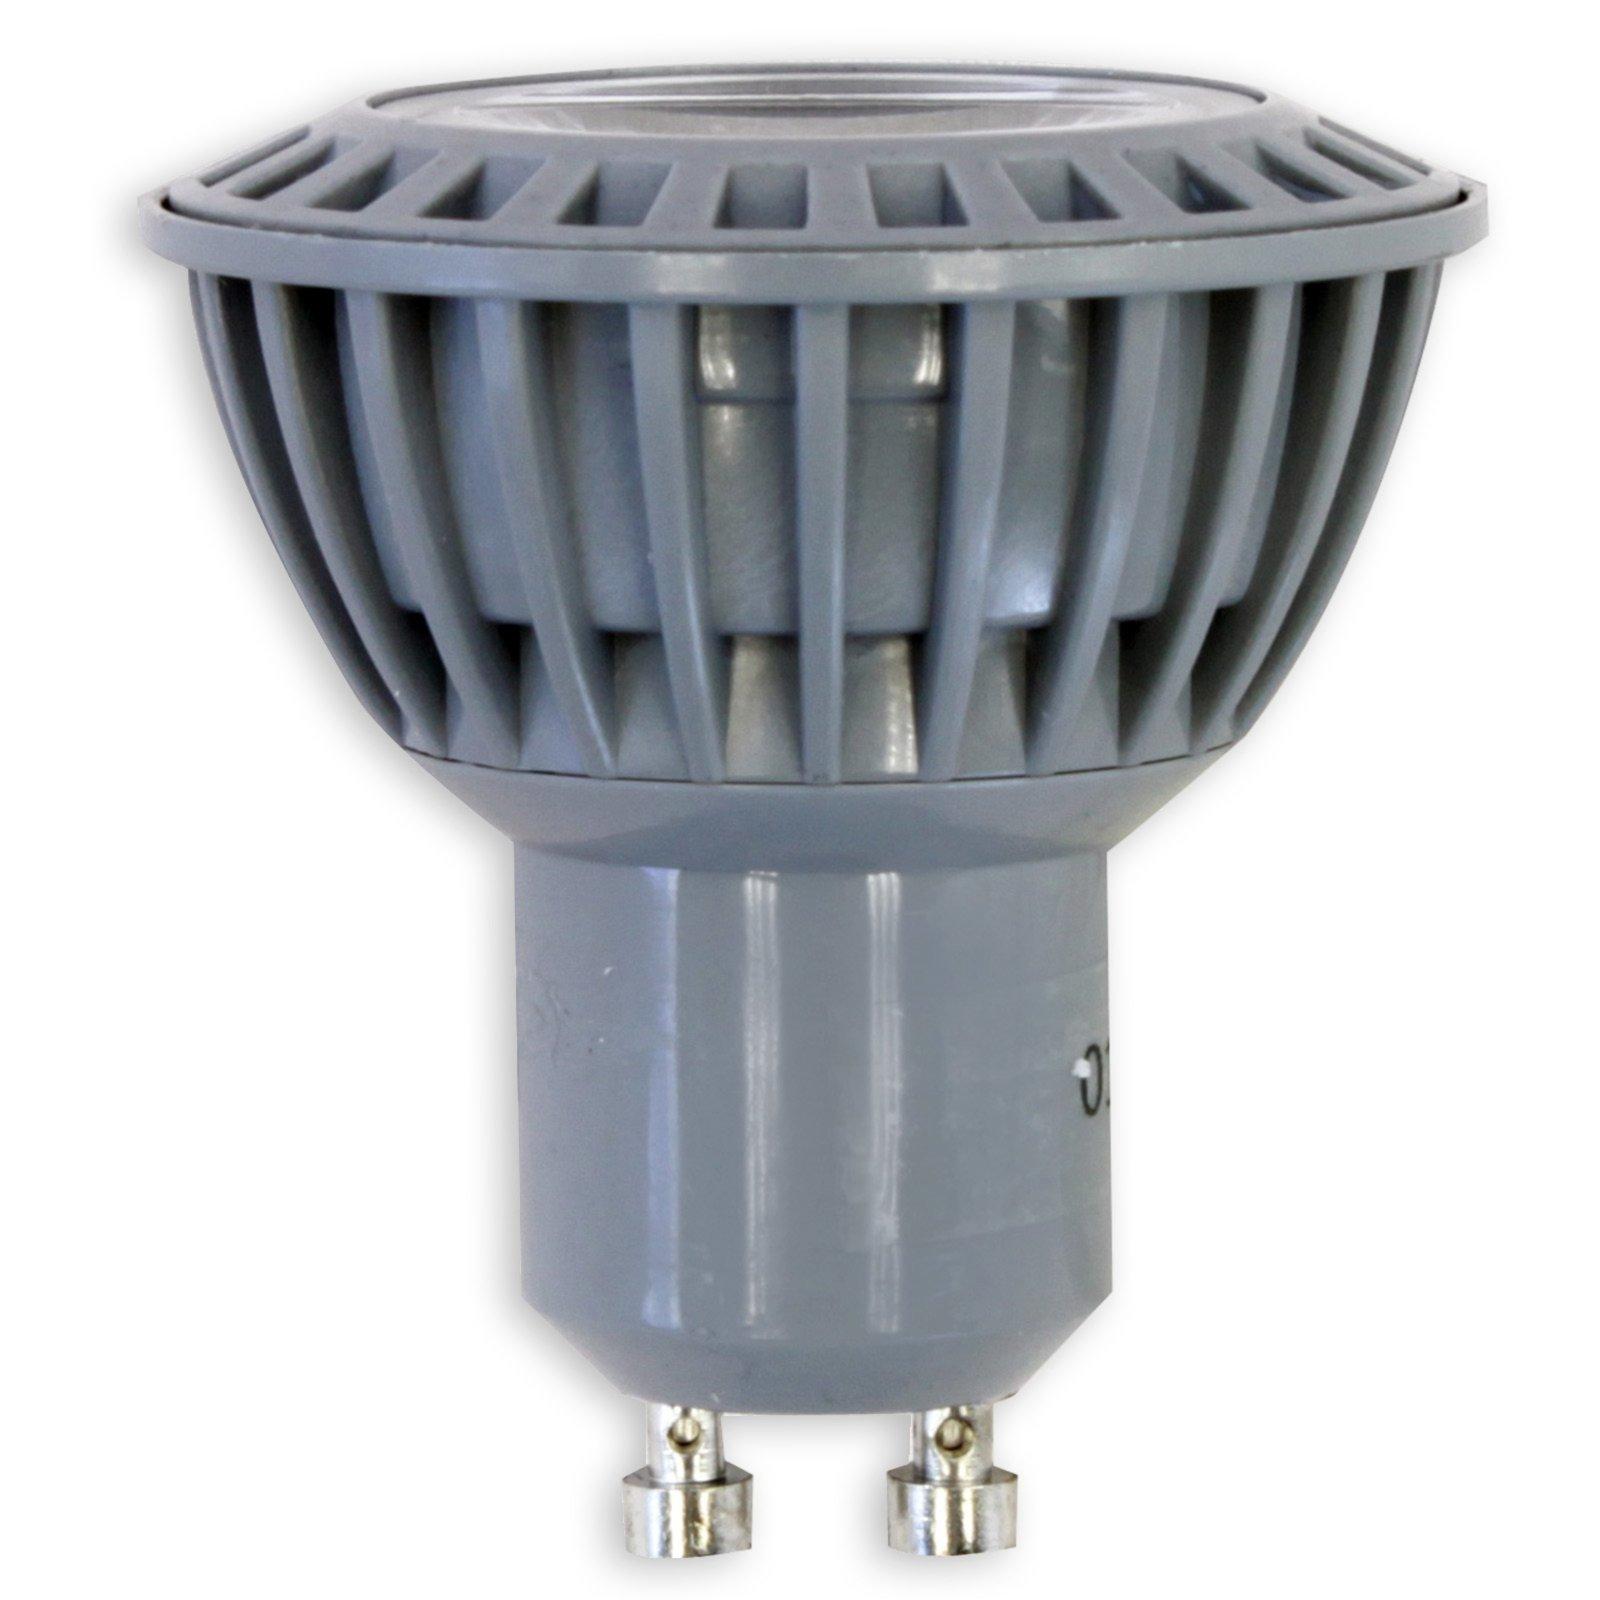 led reflektor lightme dimmbar gu10 5 w warmwei leuchtmittel lampen m belhaus roller. Black Bedroom Furniture Sets. Home Design Ideas